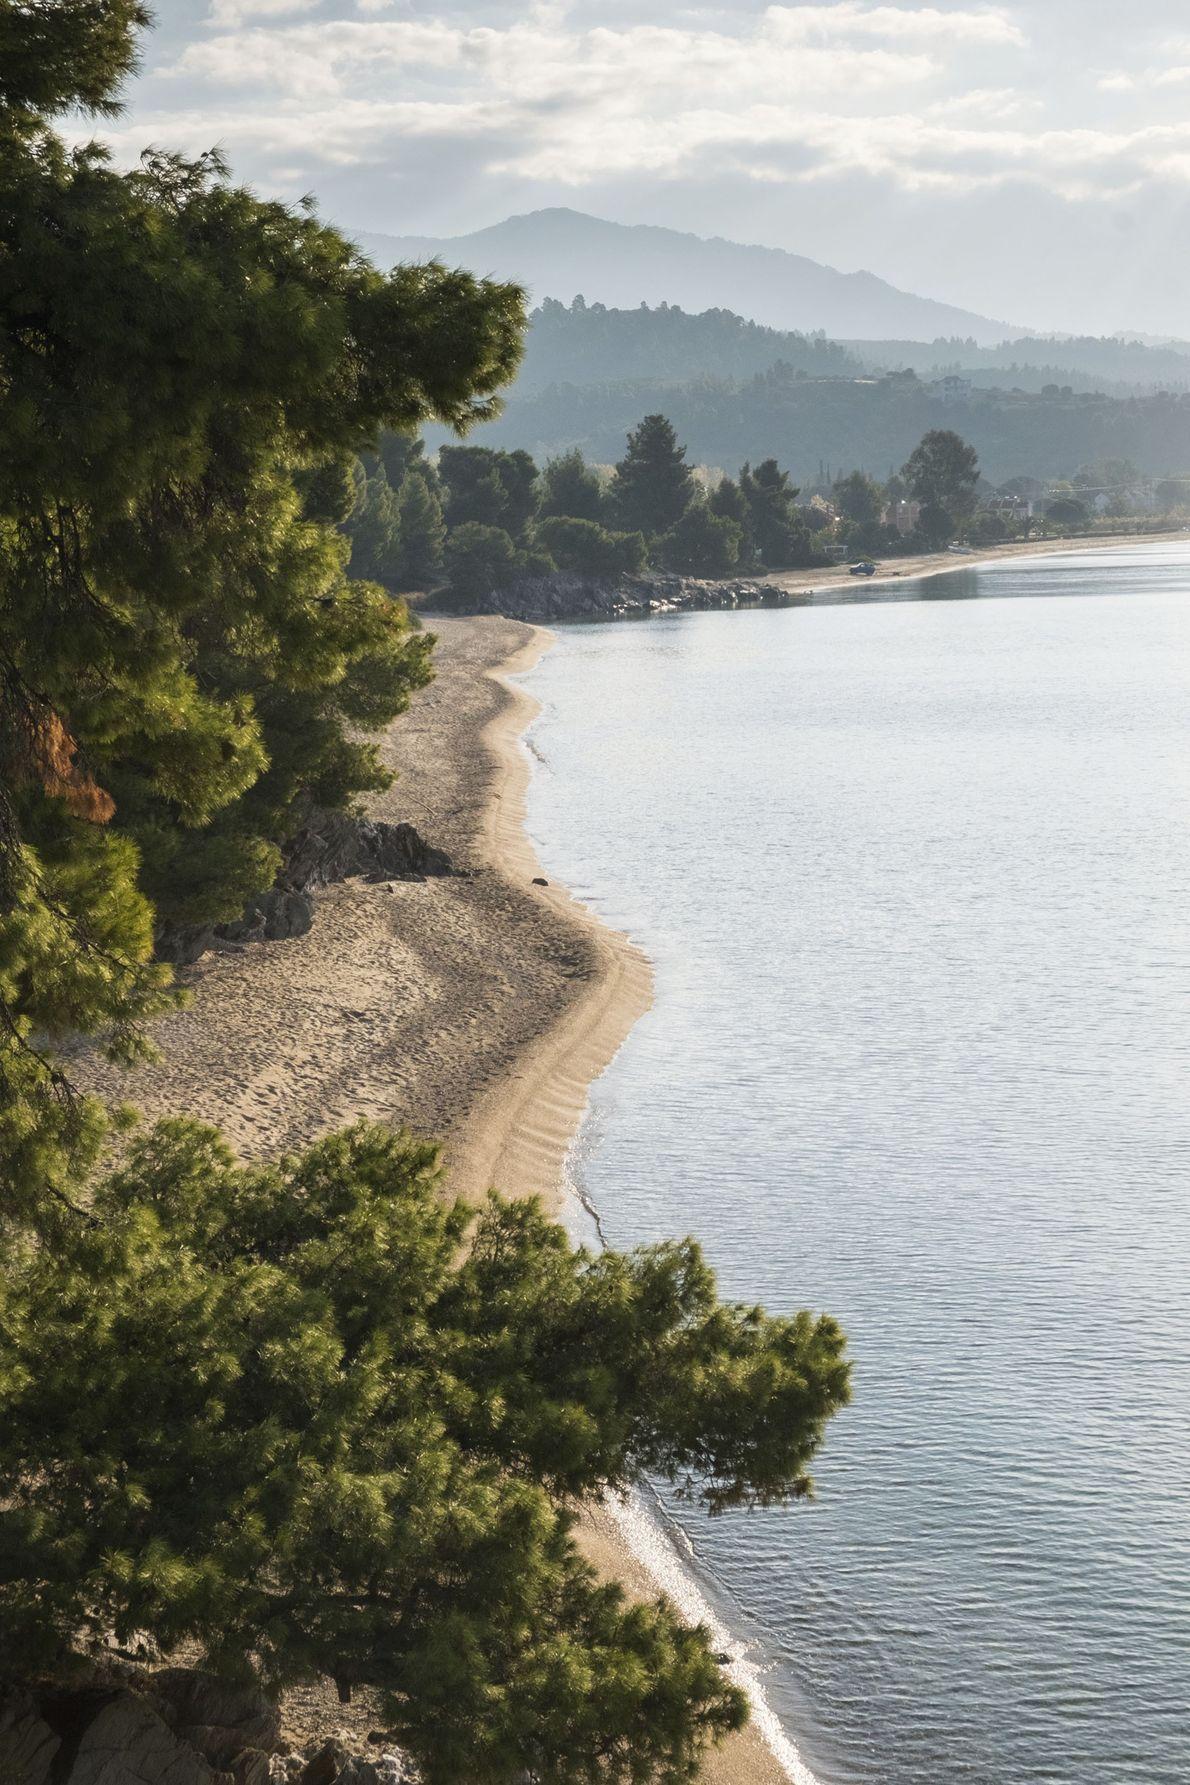 Coast between Nikitis and Neos Marmaras